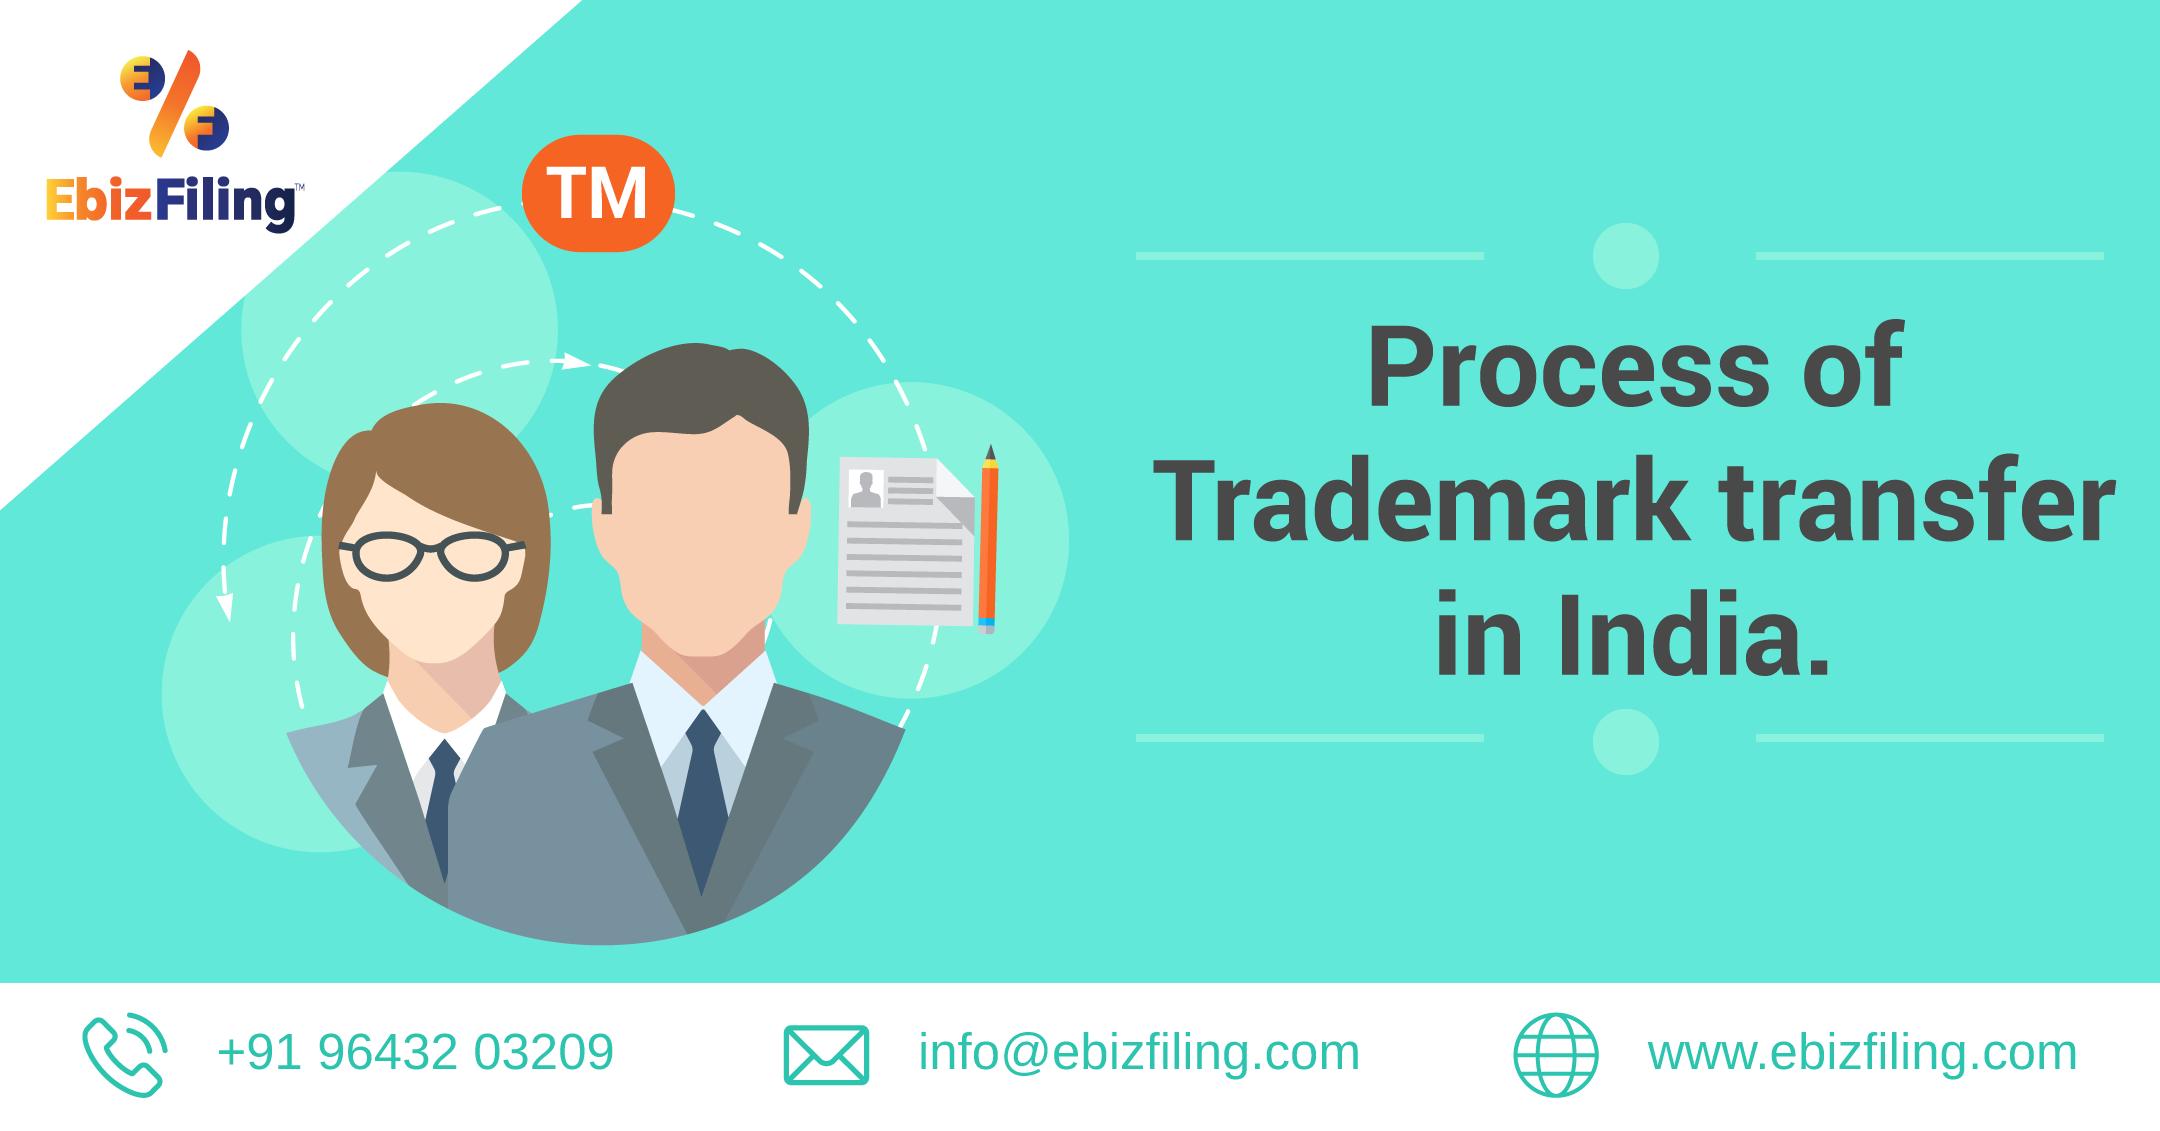 Types of Trademark Assignment, Trademark Assignment, Trademark Transfer, How to transfer Trademark, How to assign Trademark?, Process of Trademark assignment, Ebizfiling